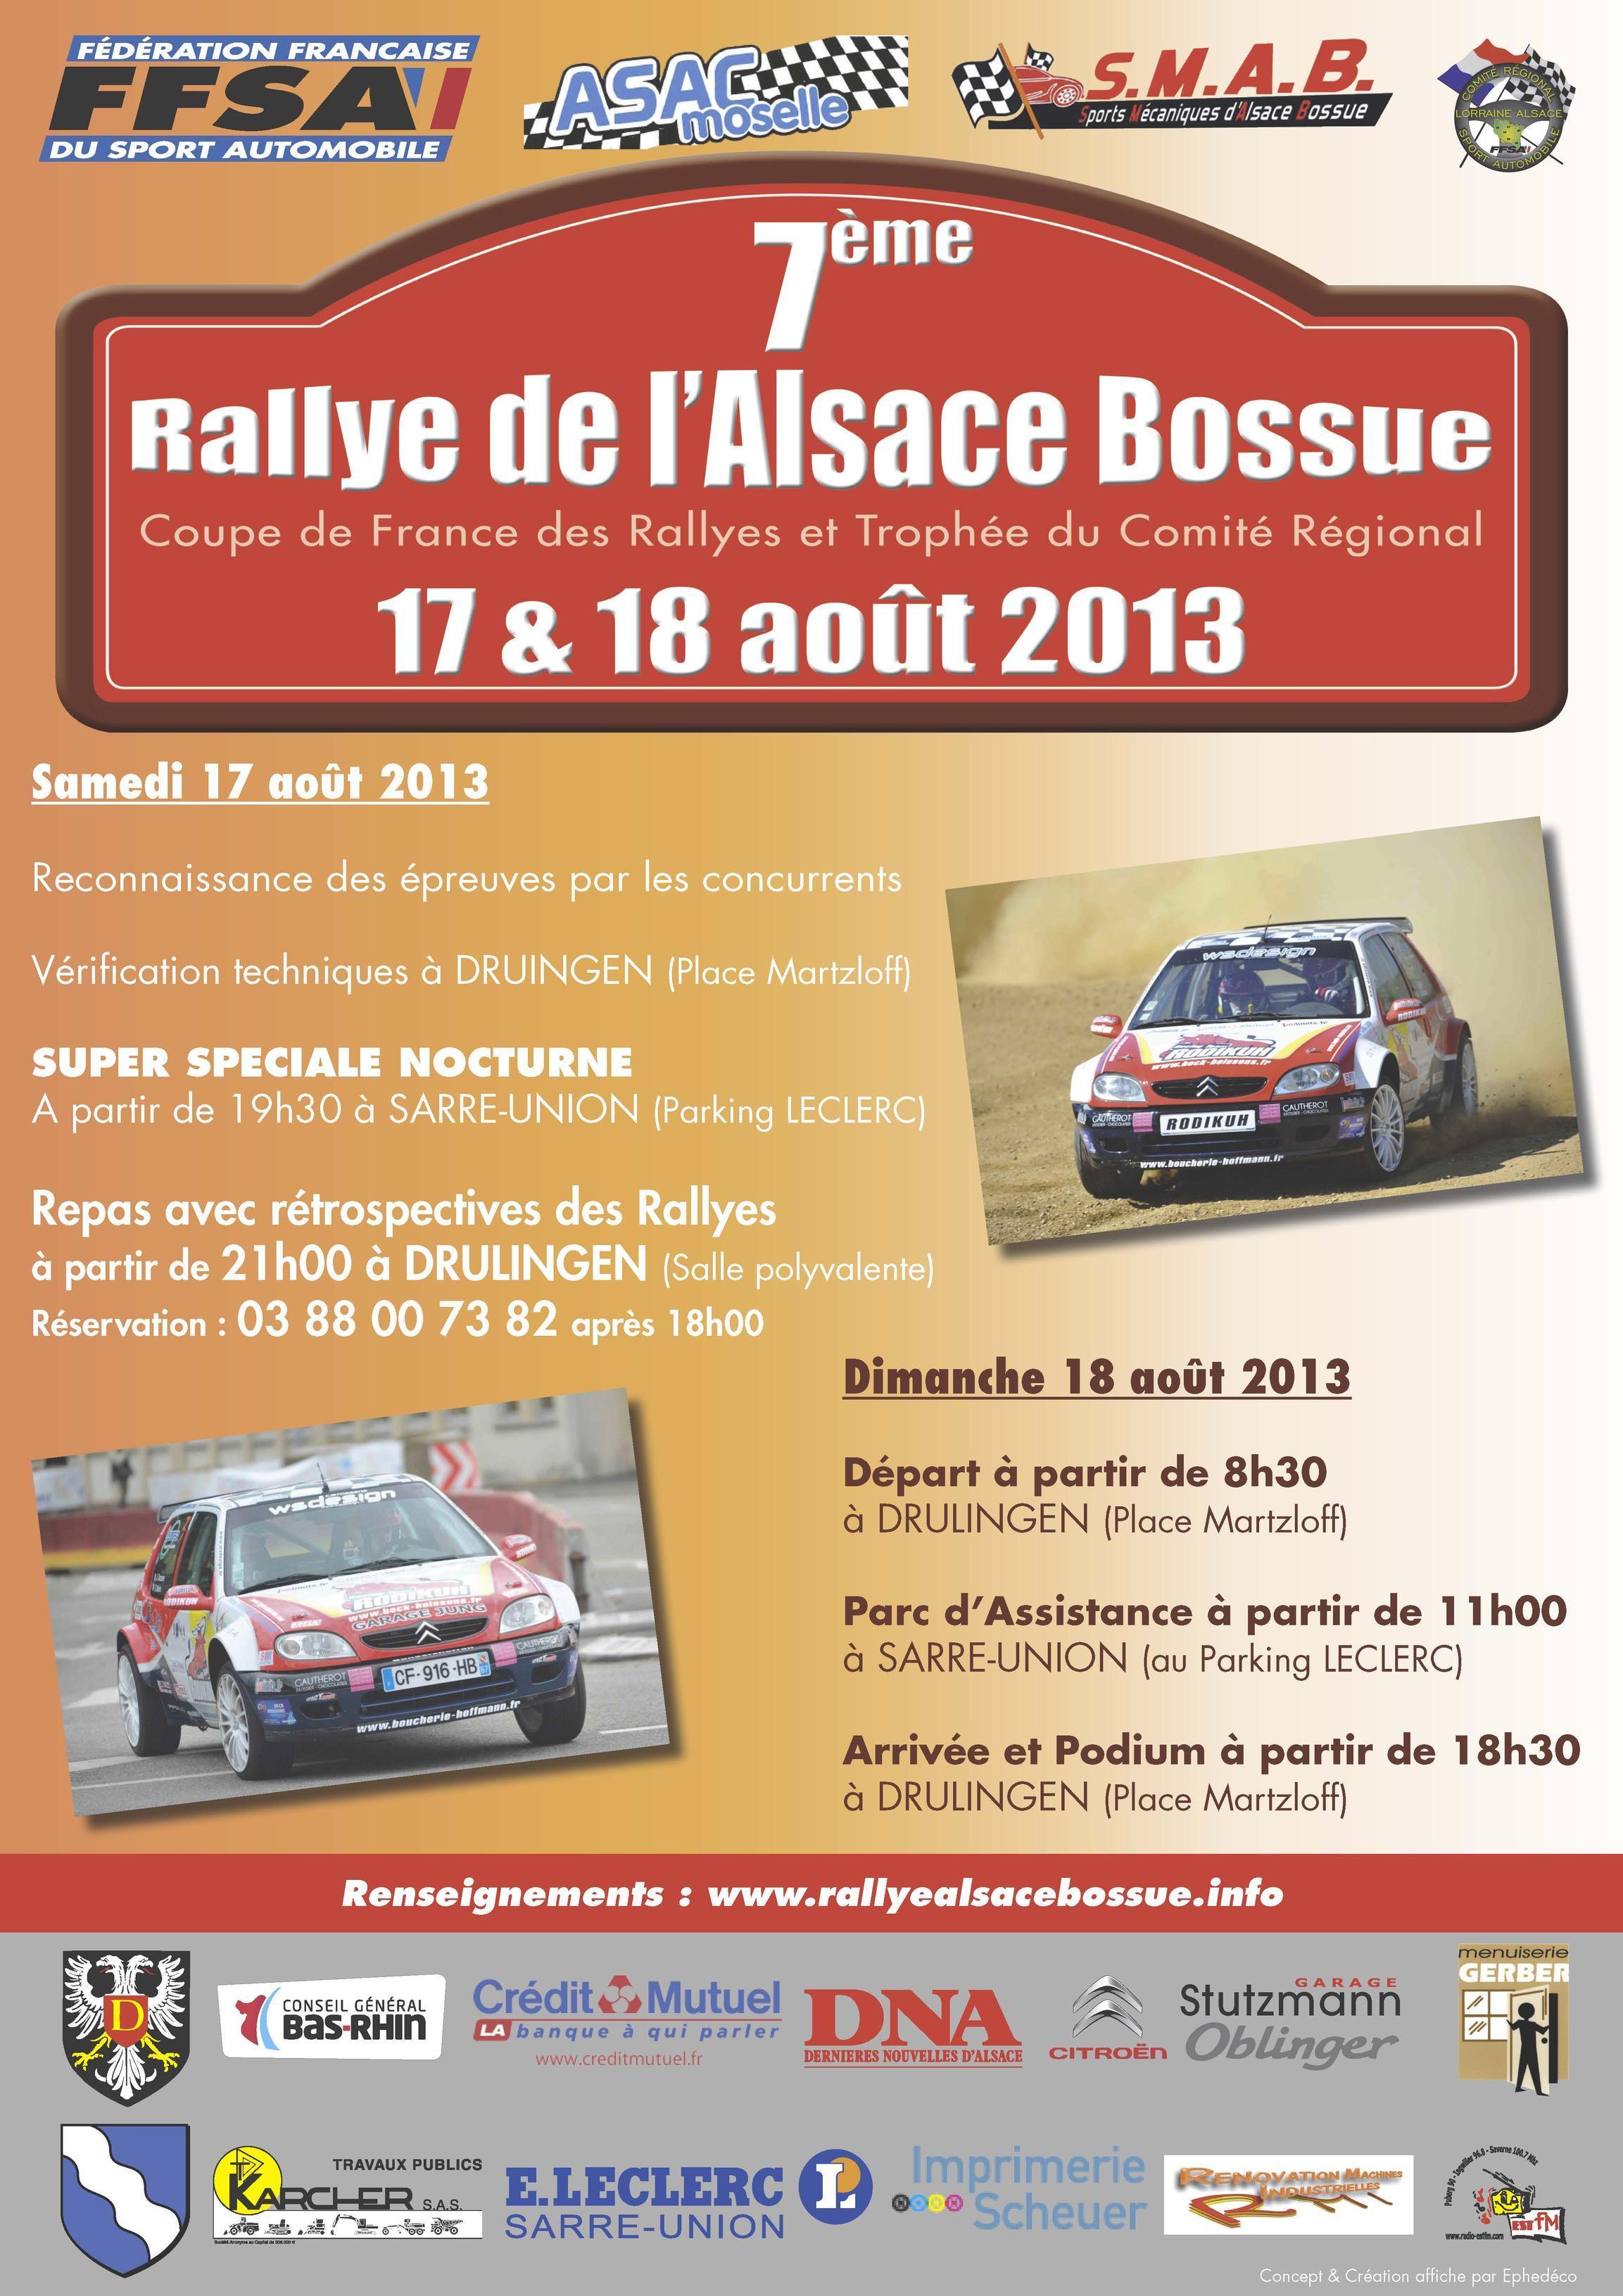 Programme-Rallye-Alsace-Bossue-2013